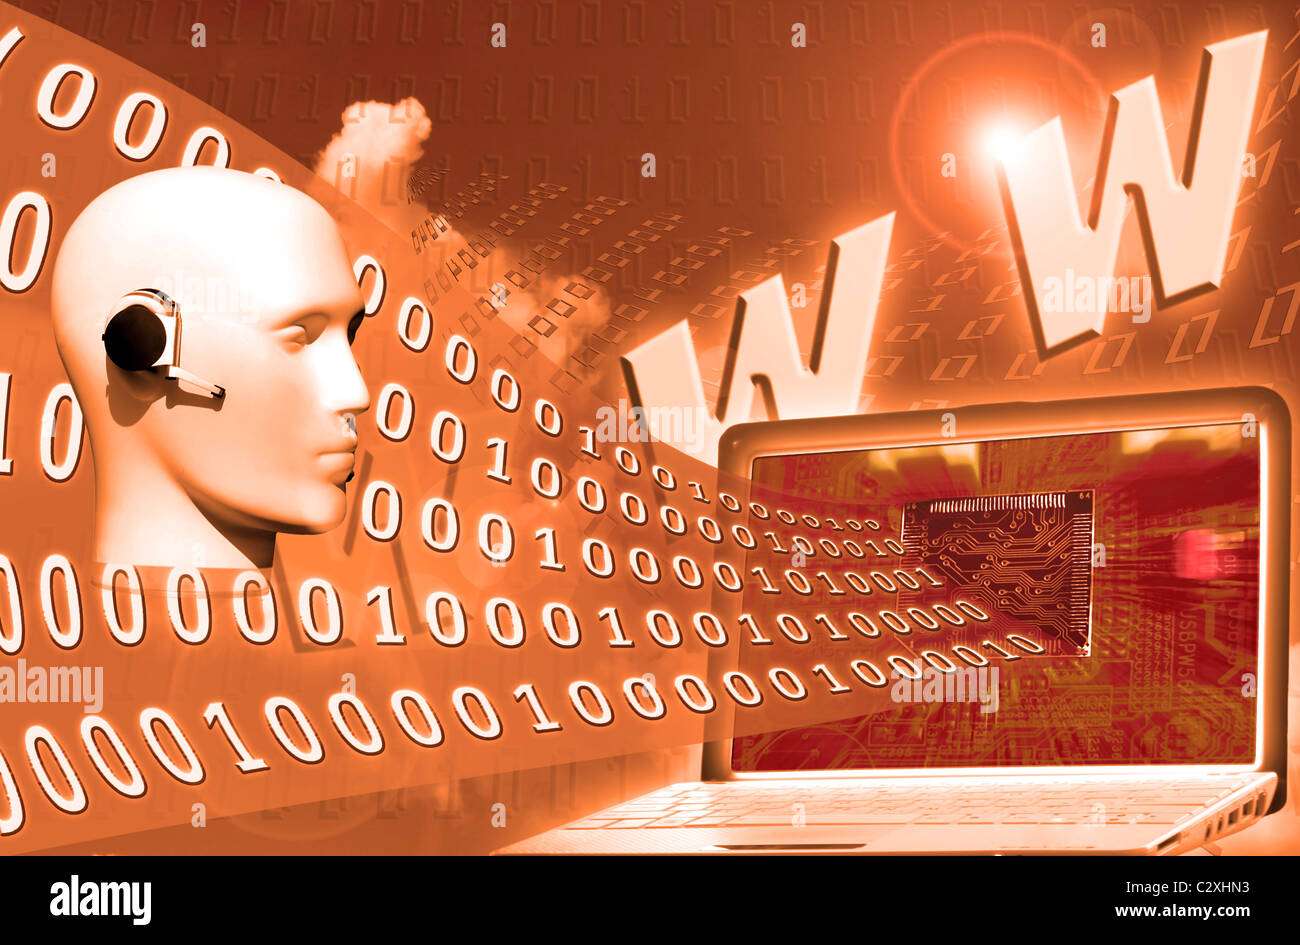 digital world: binary code floating to laptop - Stock Image